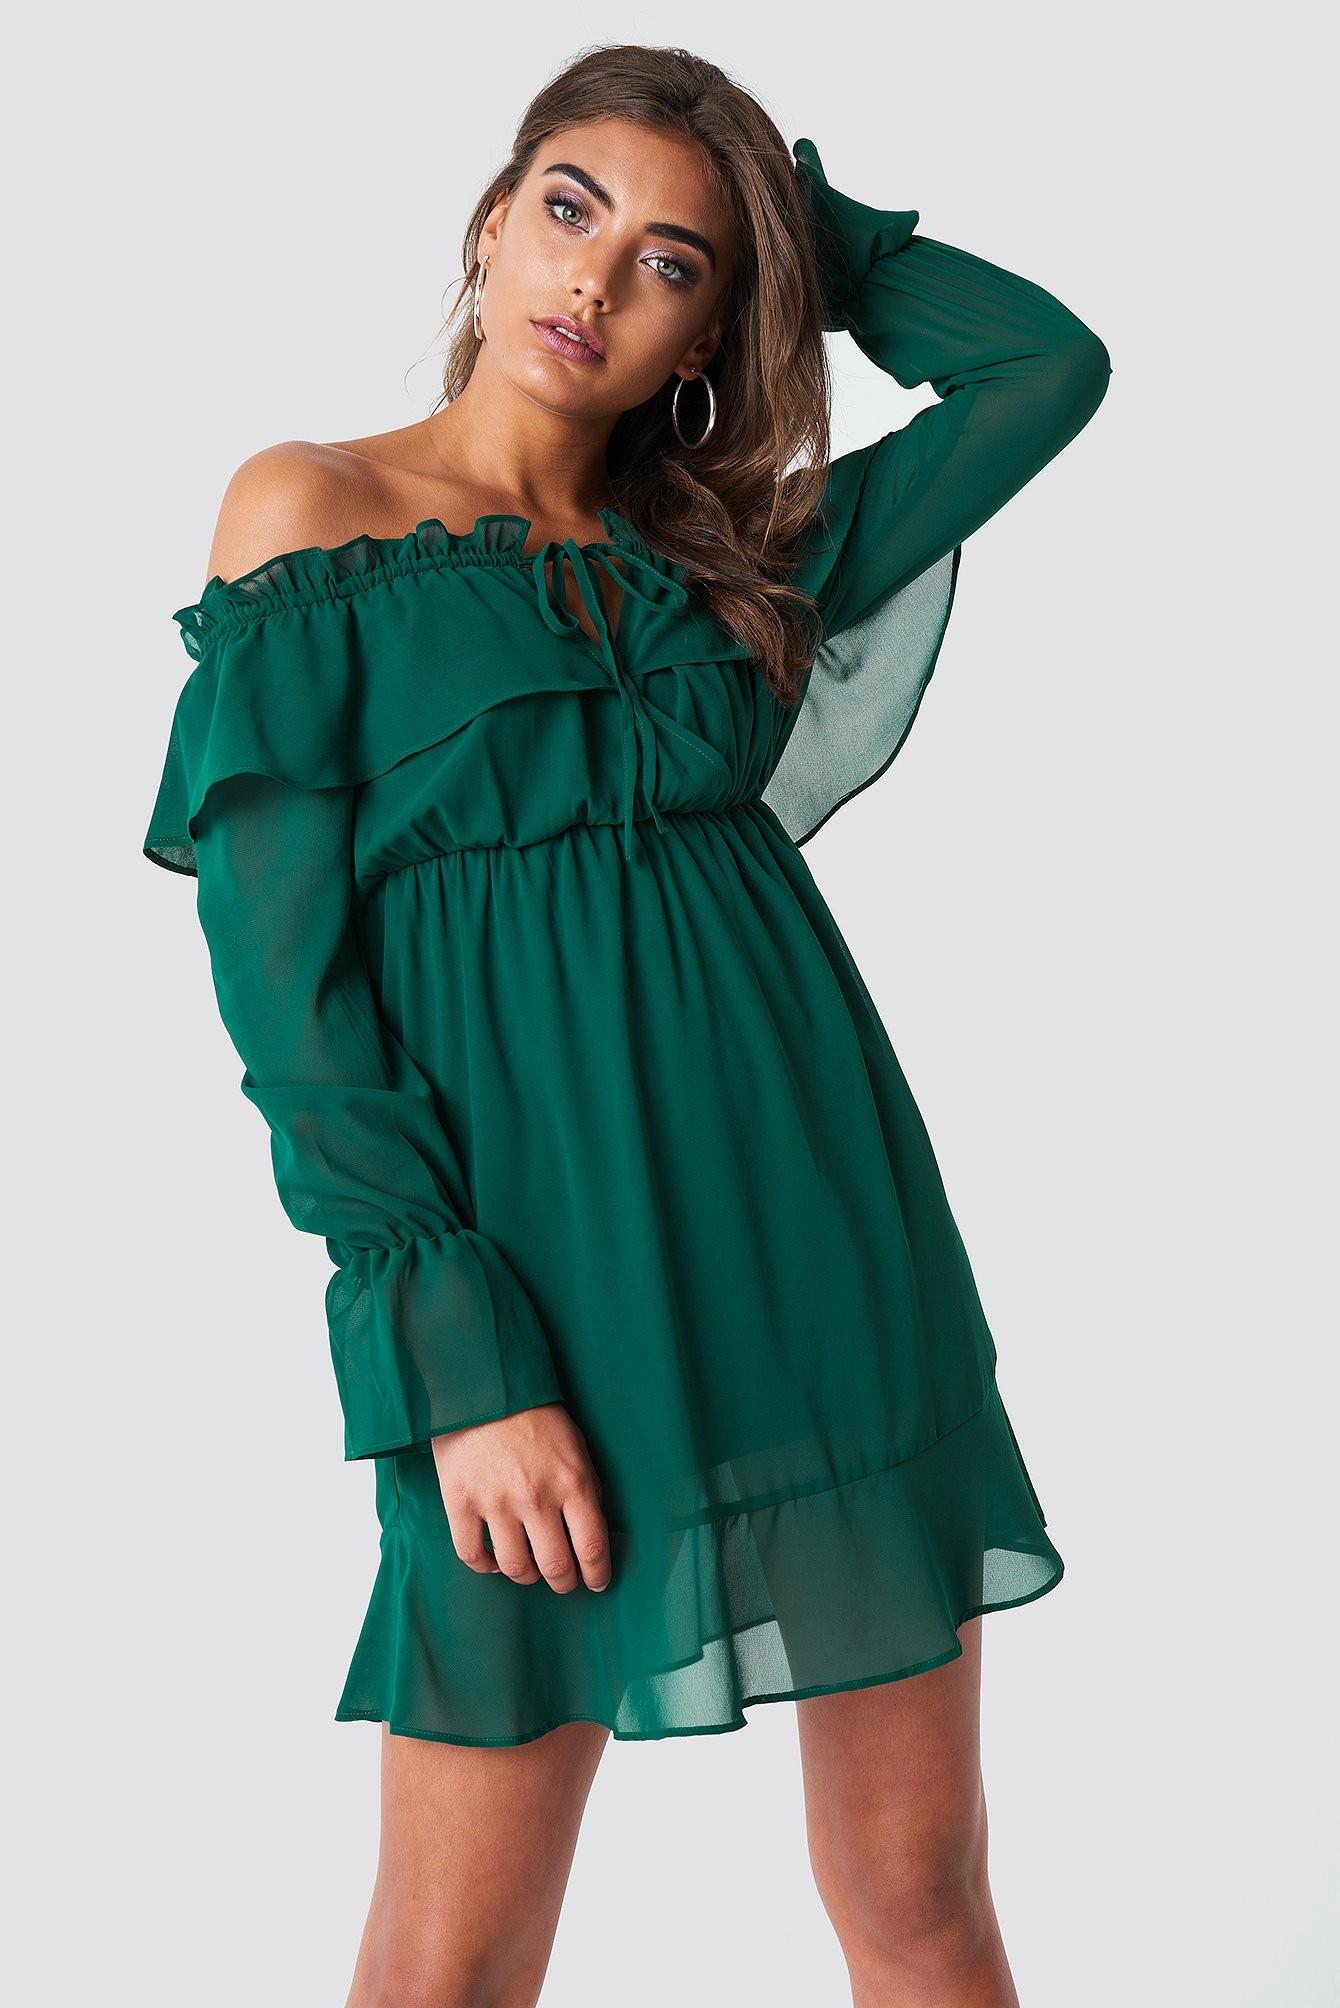 62fc18598ea2 LivingLesh - Philadelphia Petite Fashion   Luxury Lifestyle Blog ...